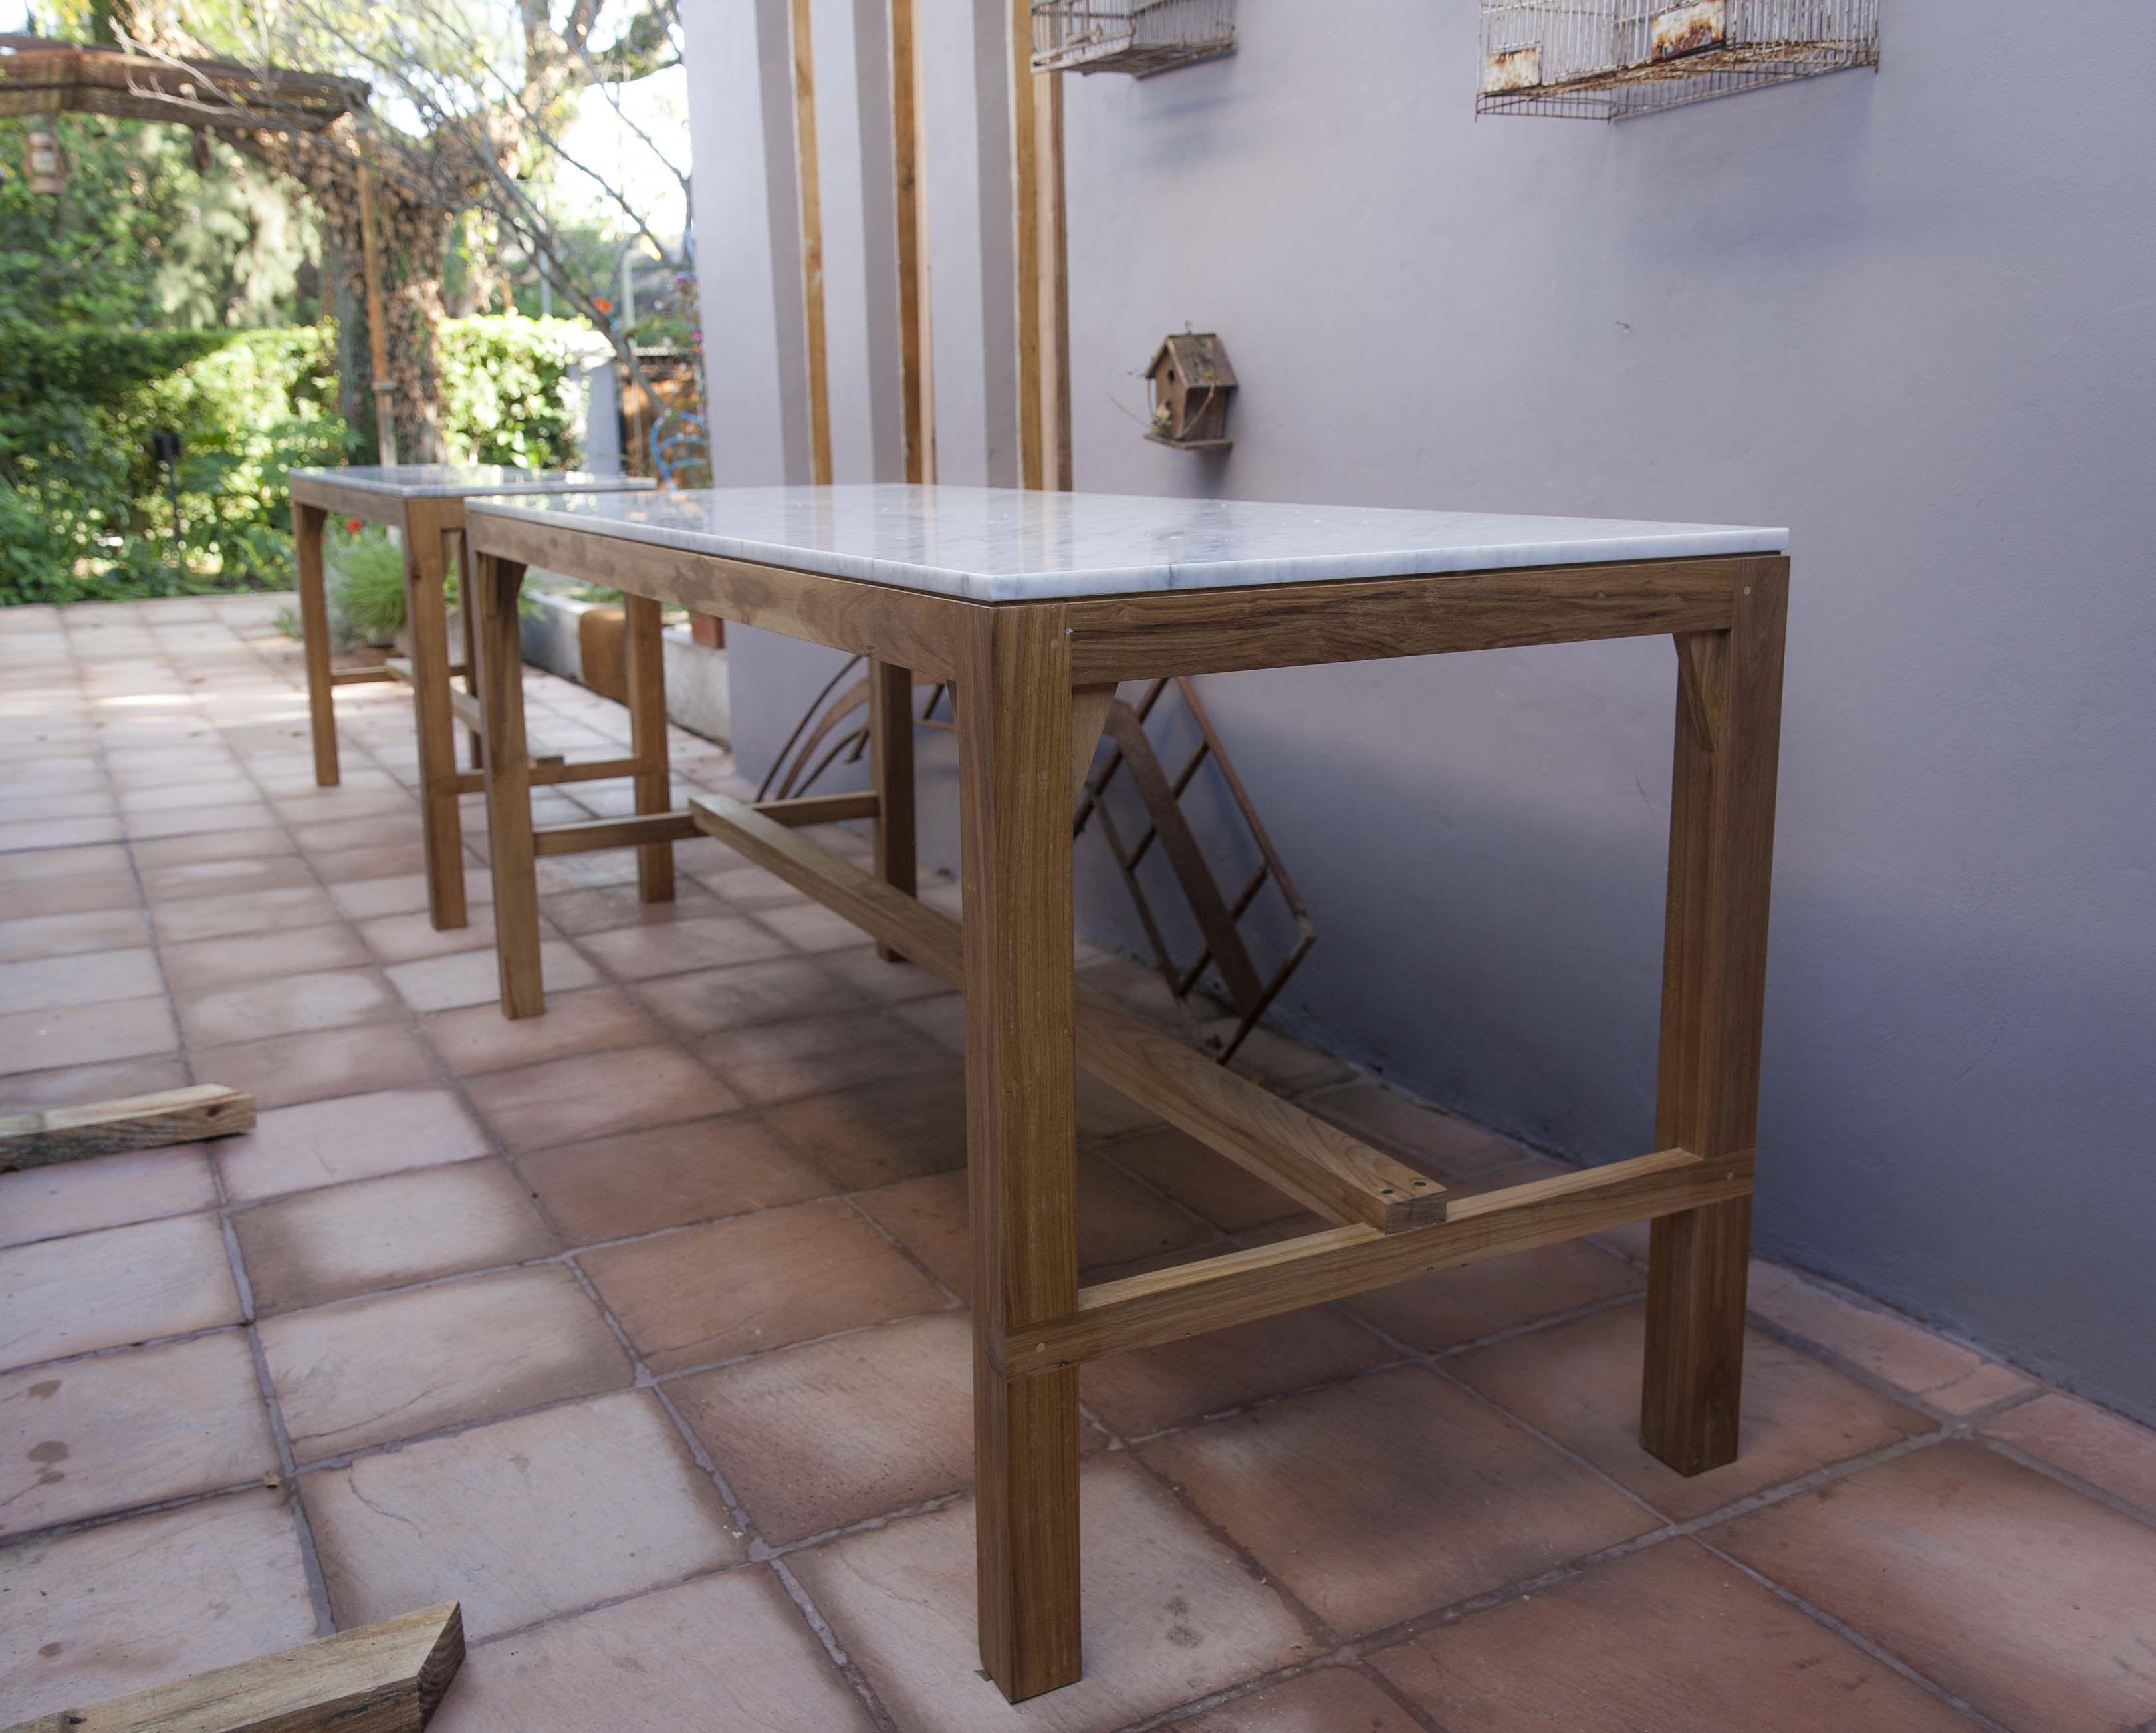 Mesa alta madera de petiribi y tapa de m rmol de carrara - Alicatar cocina detras muebles ...